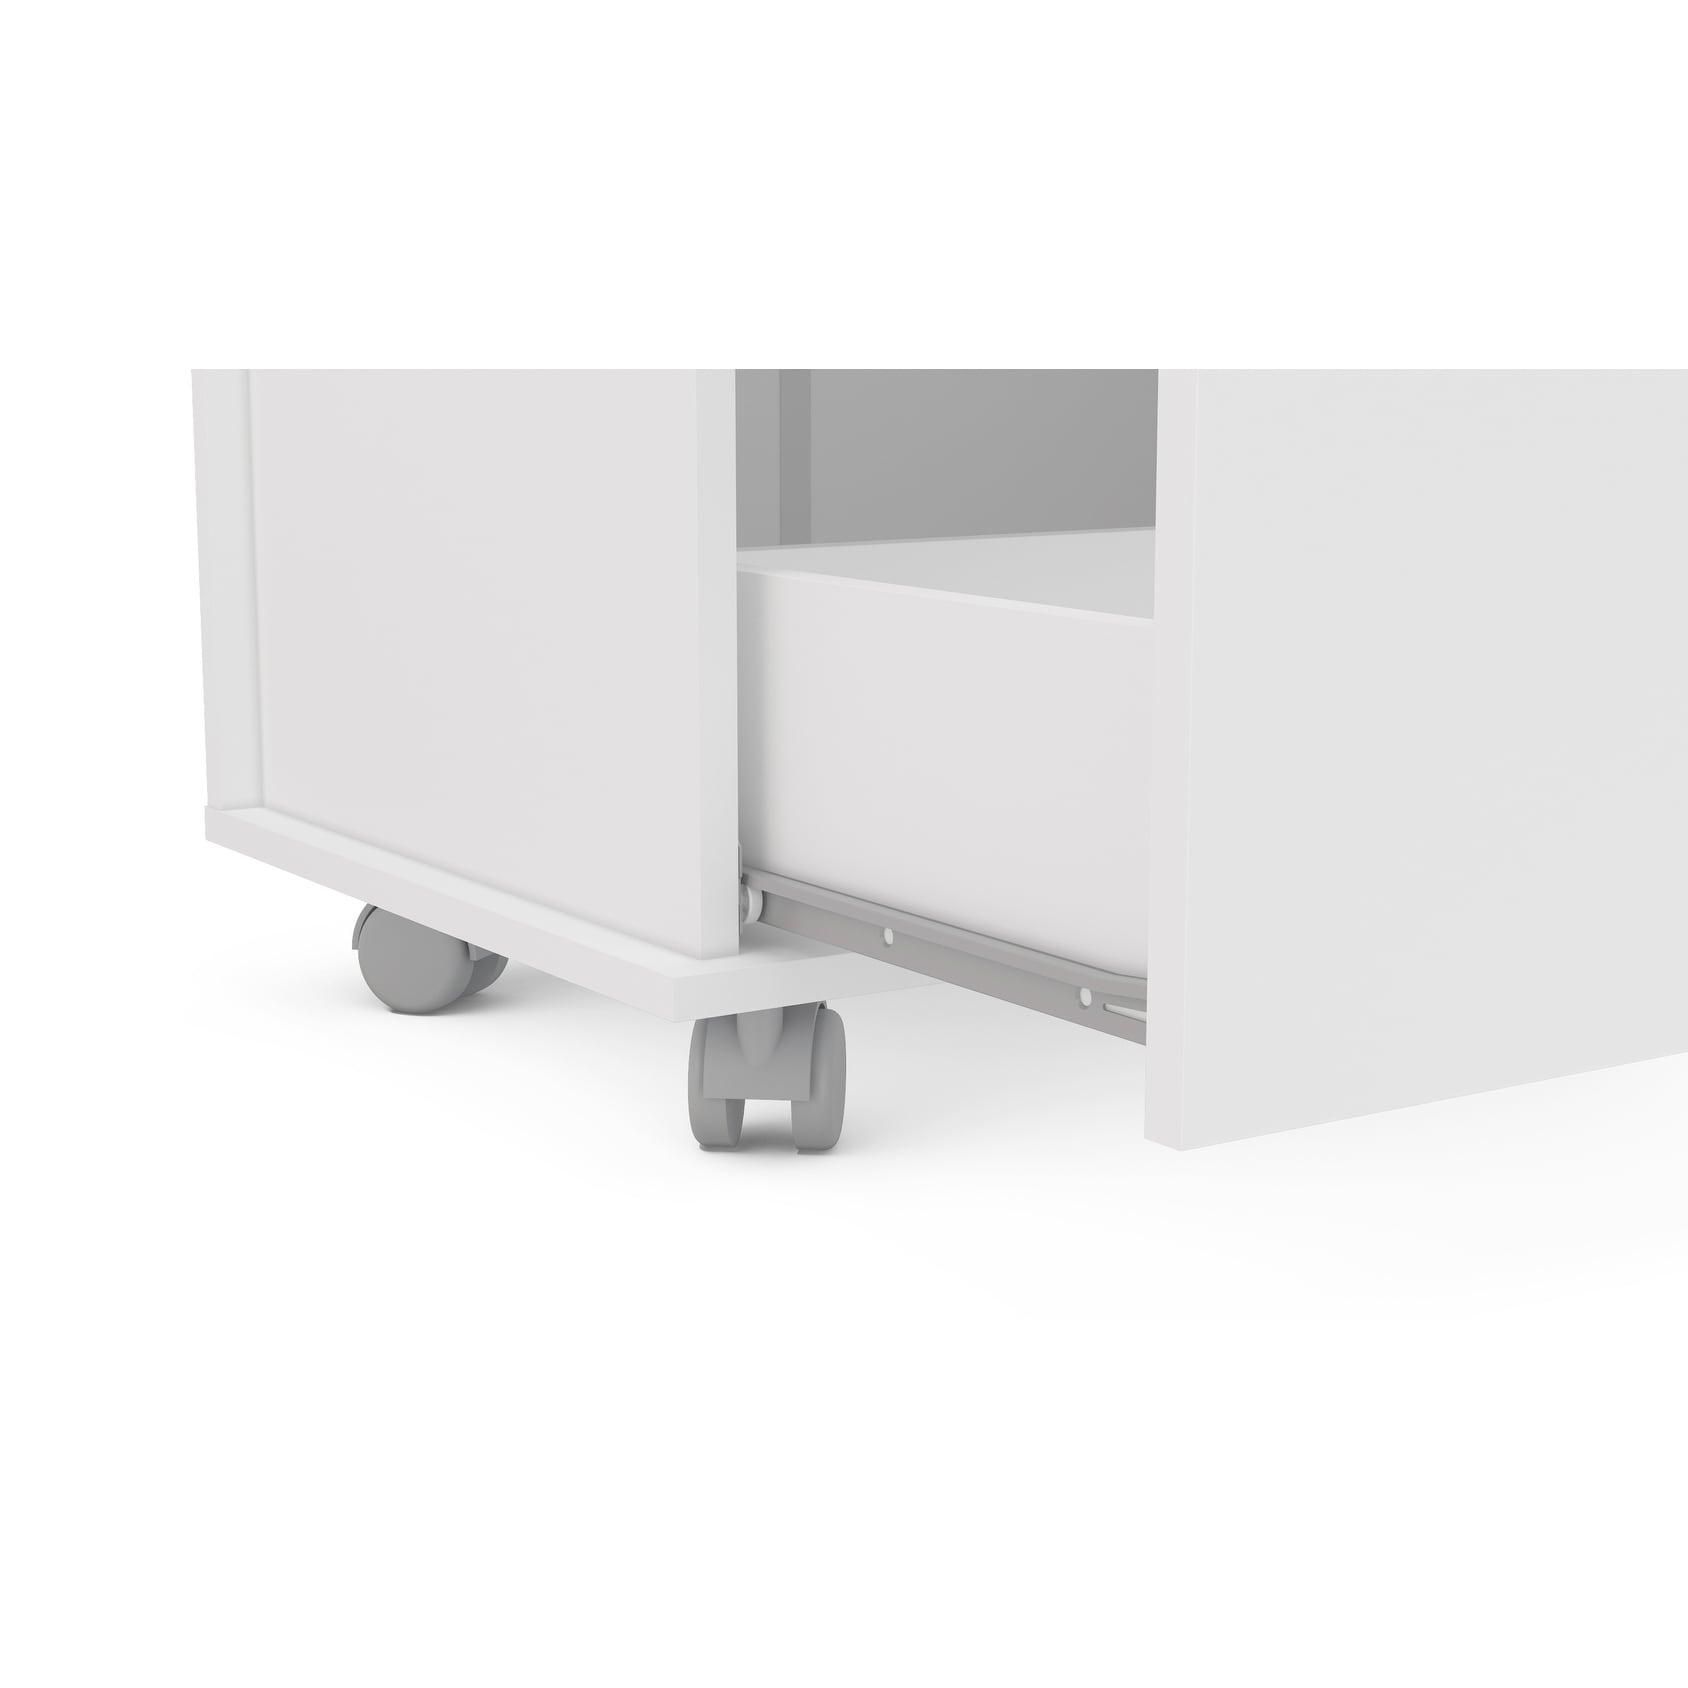 Polifurniture 401607780002 Damasco File Cabinet